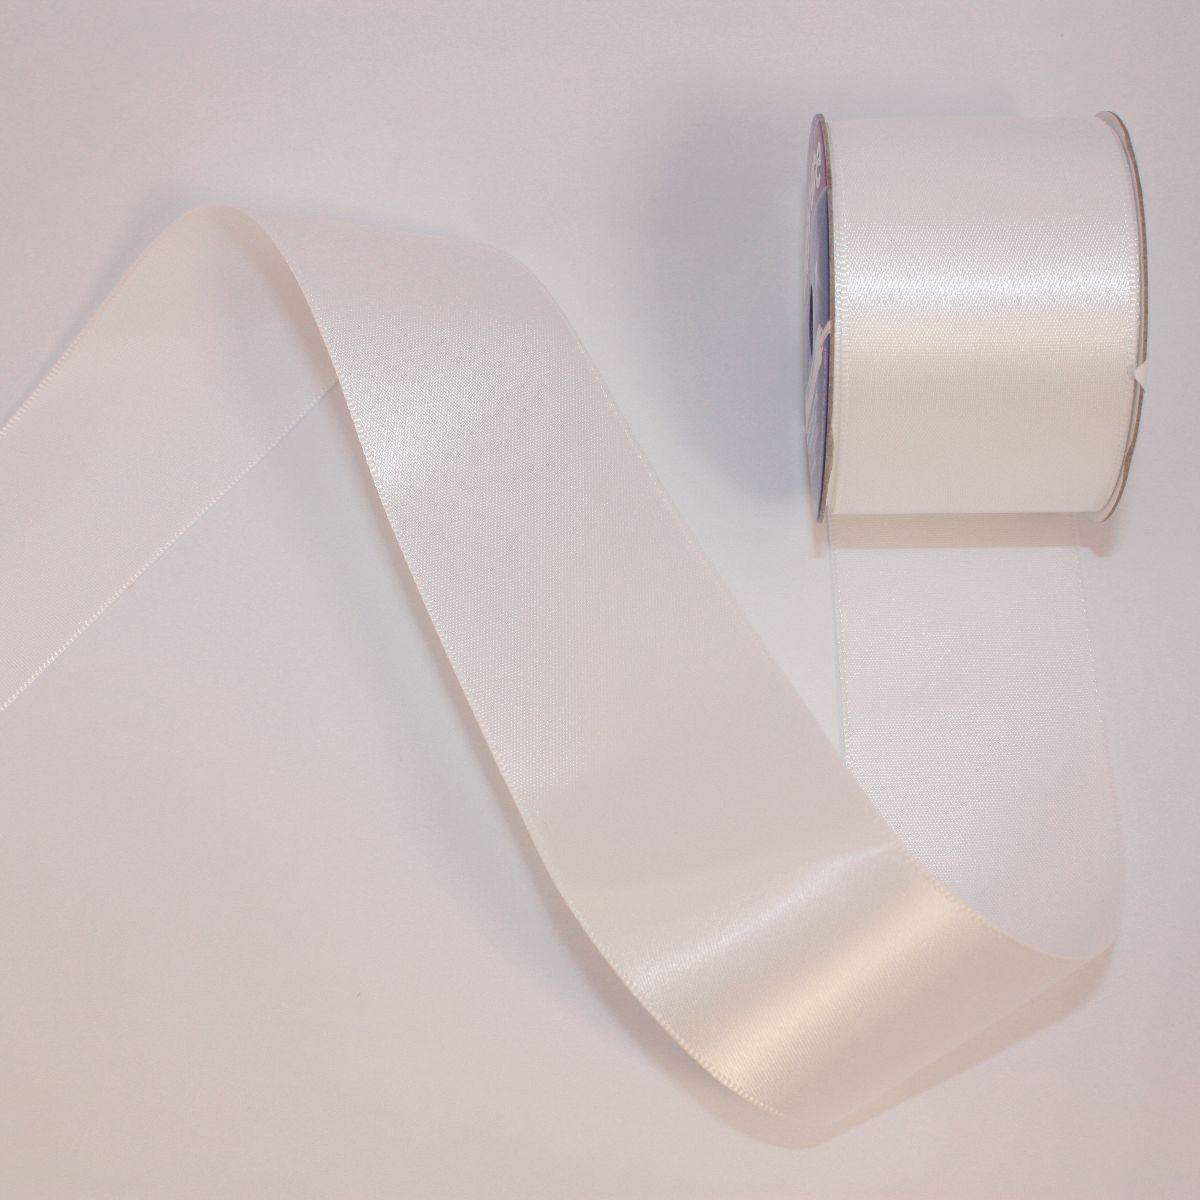 Ruban satin en bobine blanc 38 mm